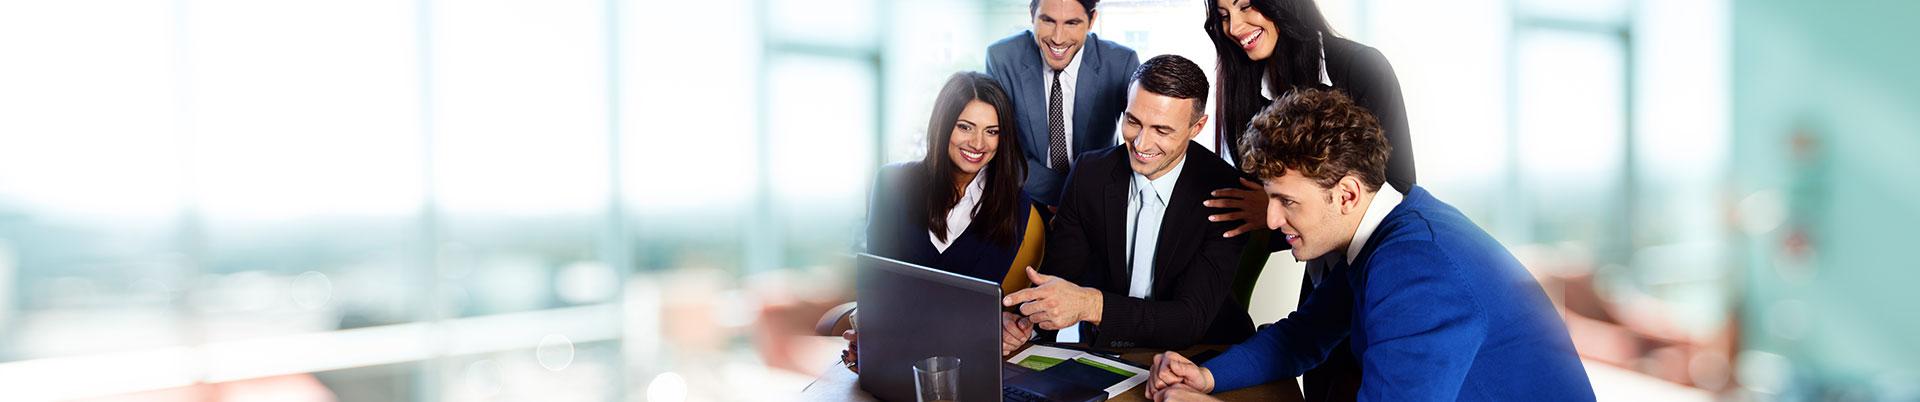 Employee Training Software Development